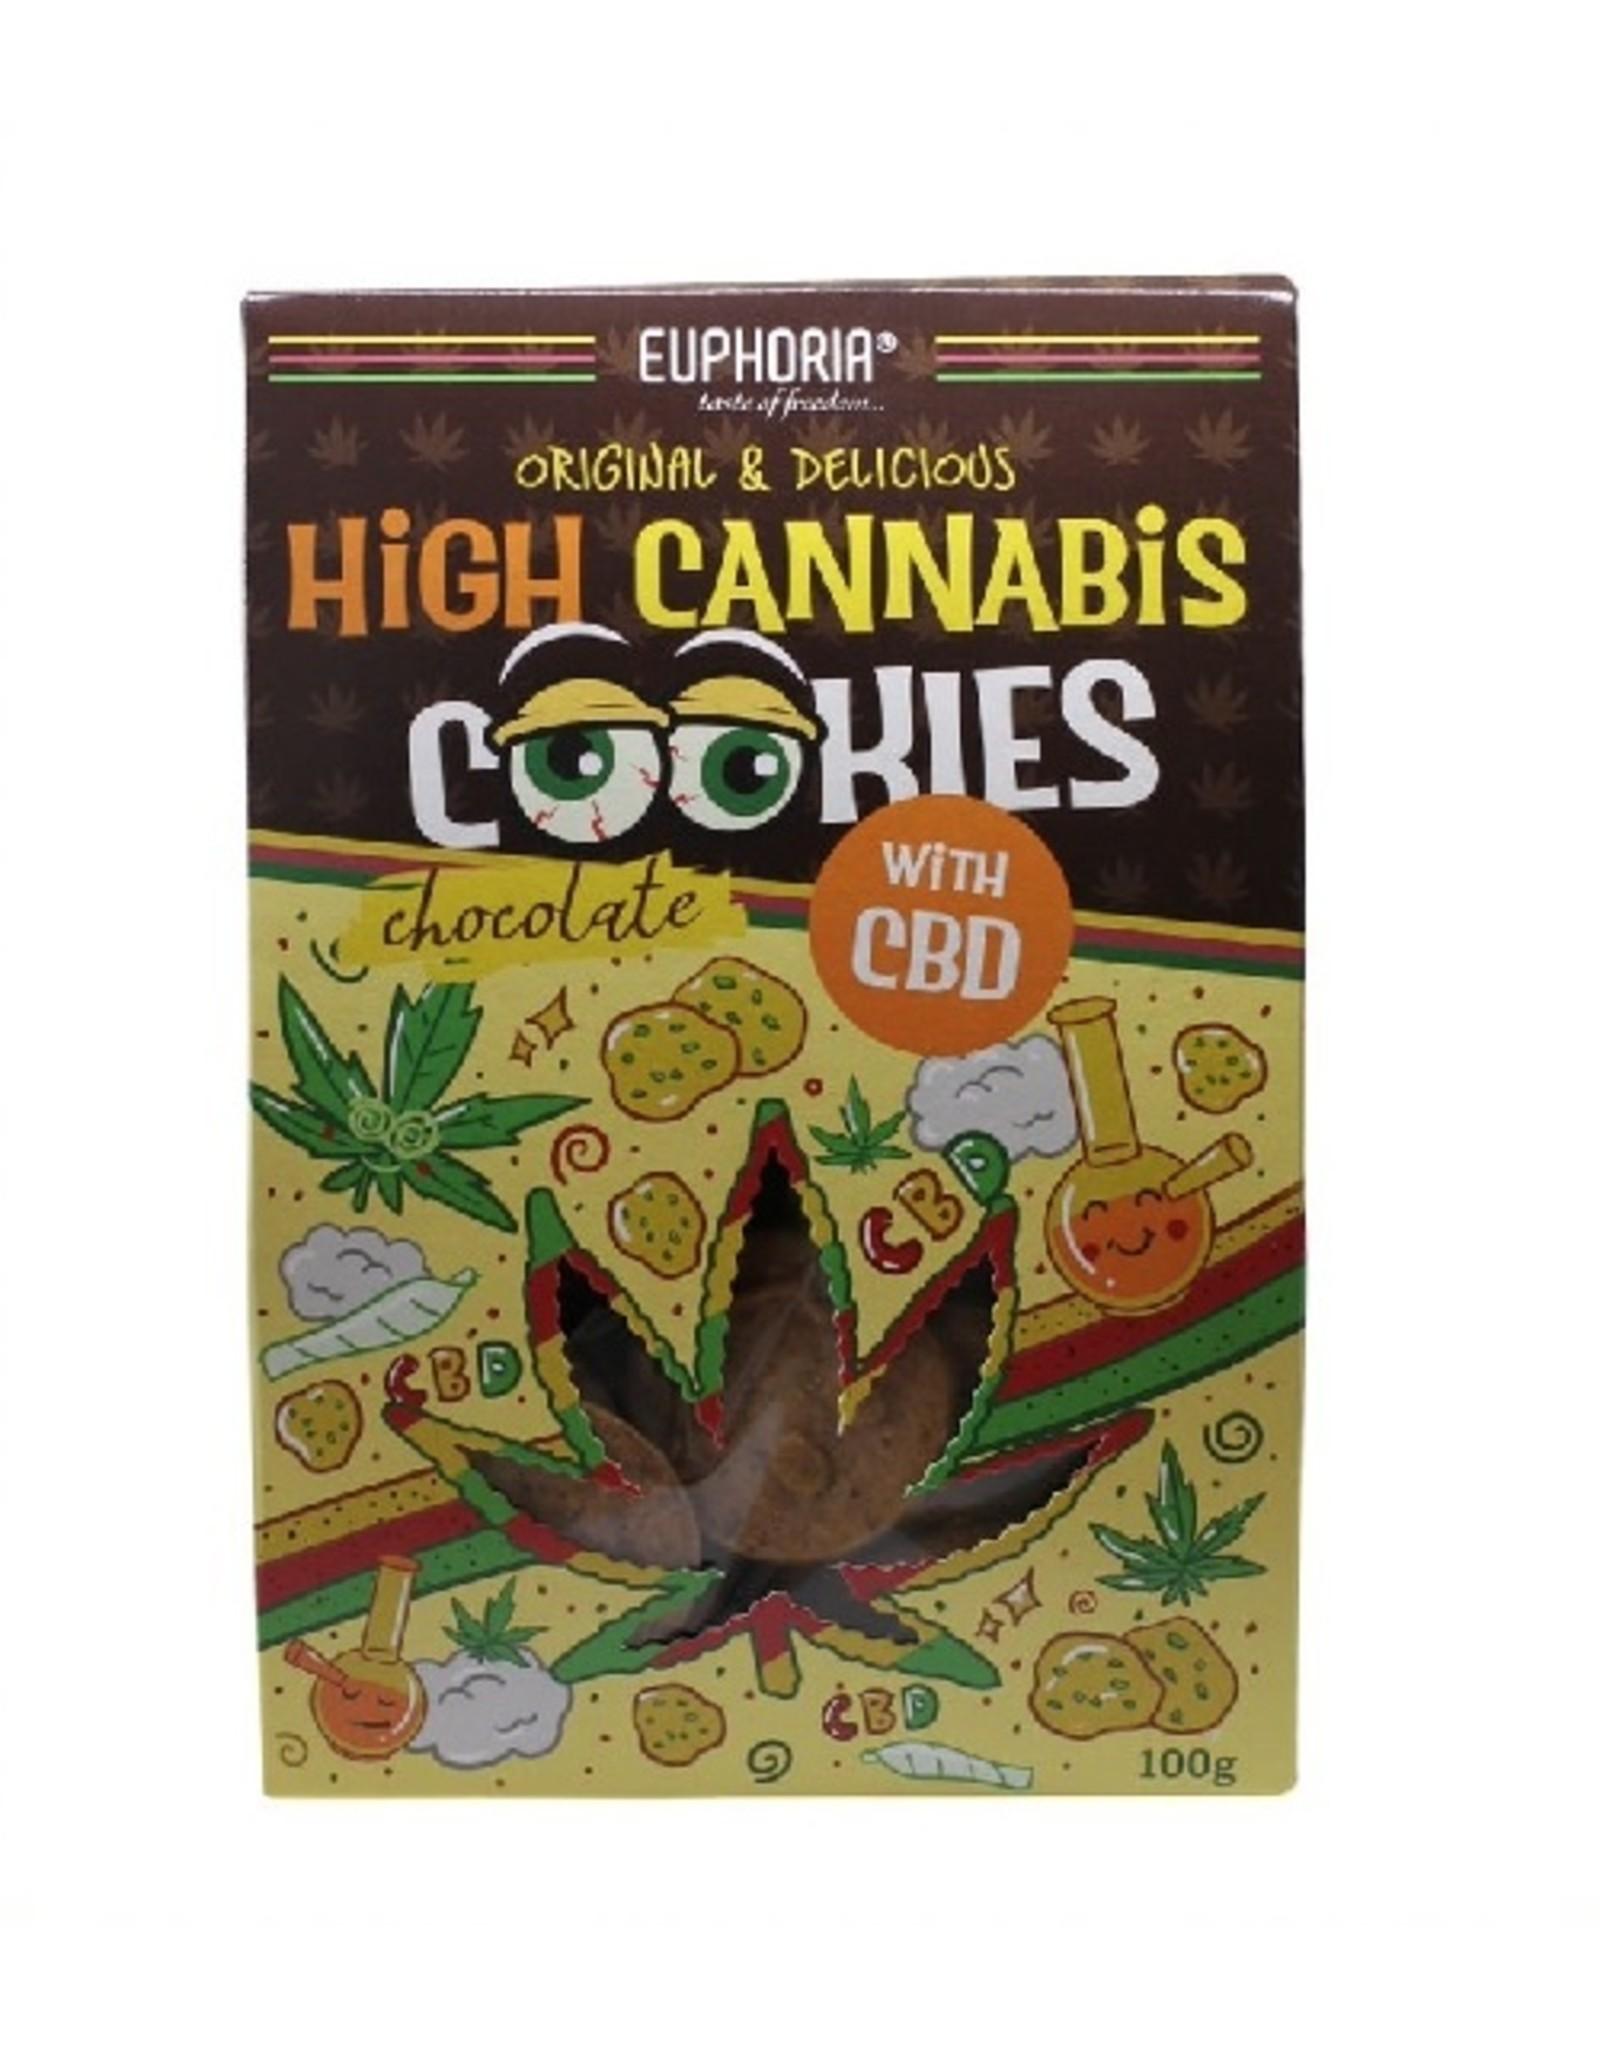 Euphoria High Cannabis Cookies CBD Chocolate